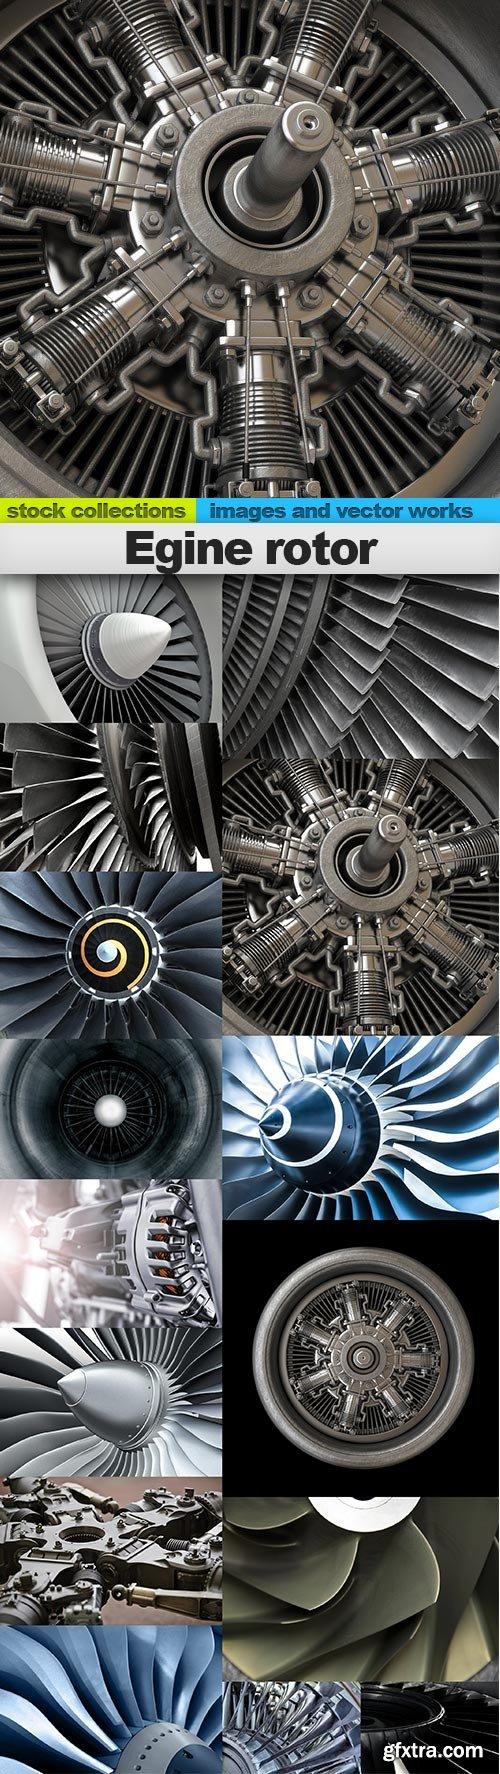 Egine rotor, 15 x UHQ JPEG